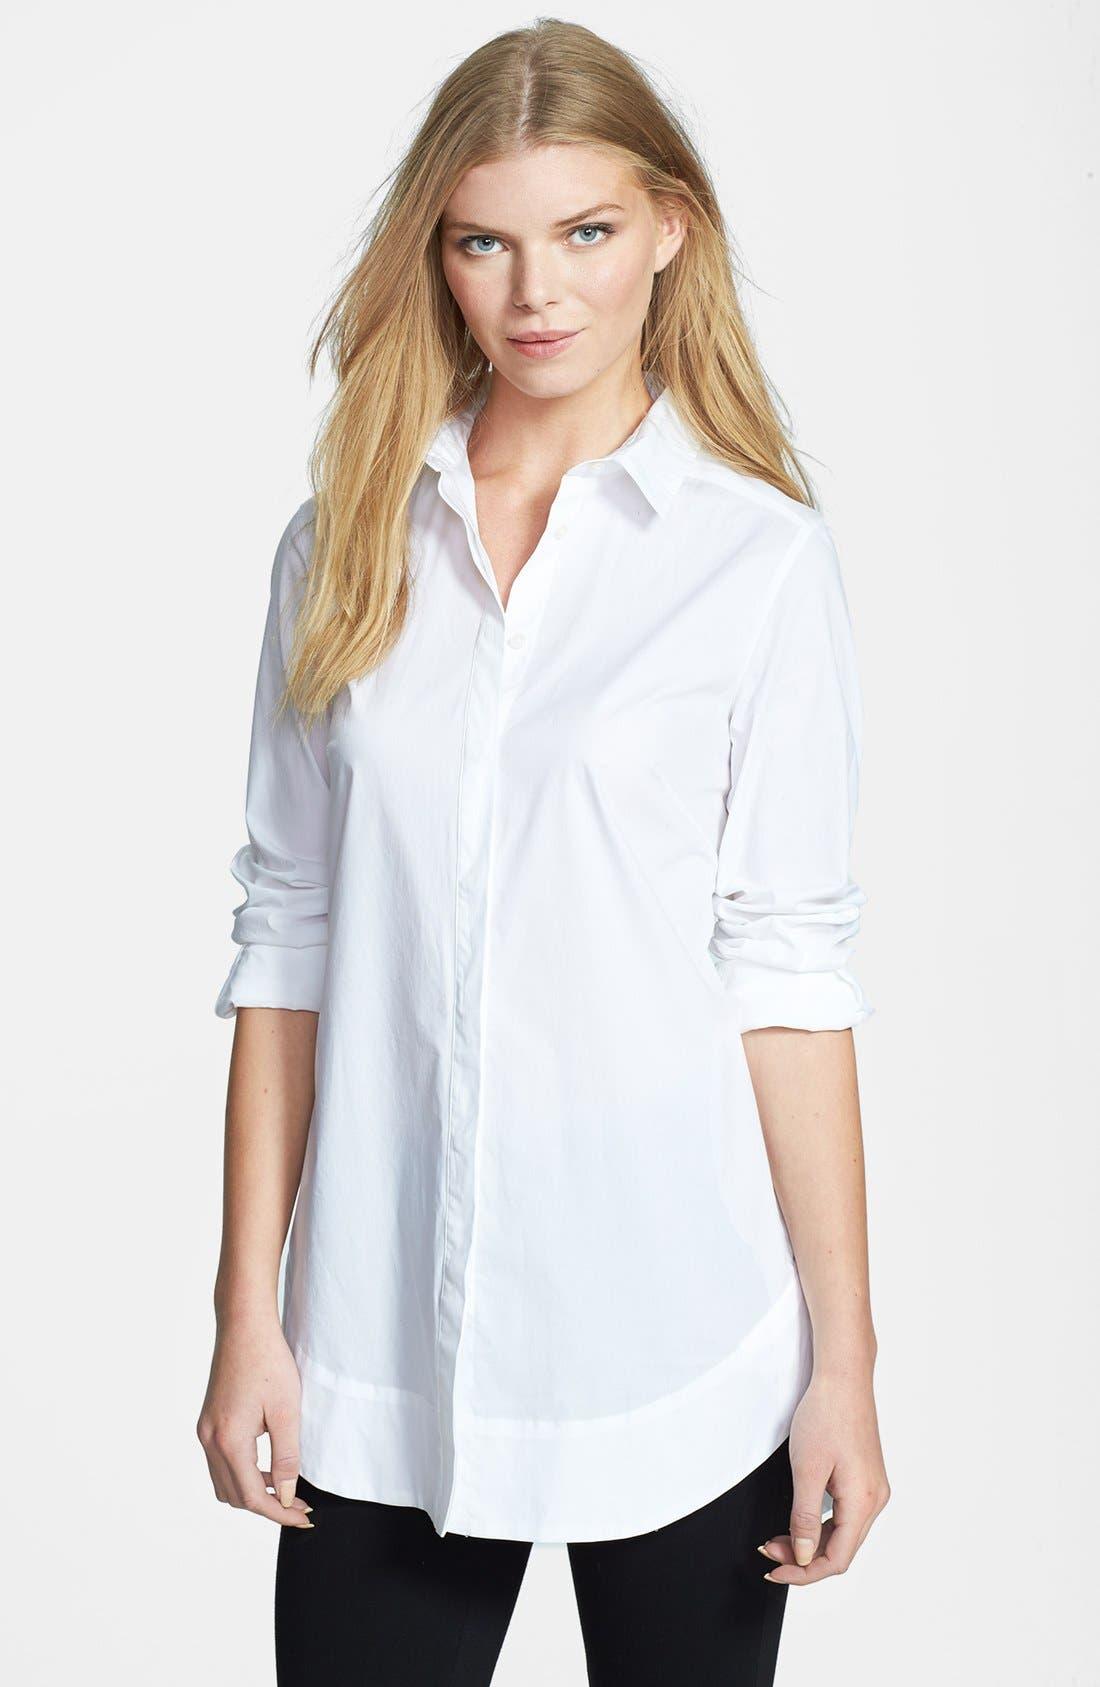 Alternate Image 1 Selected - Weekend Max Mara 'Refolo' Poplin Tunic Shirt